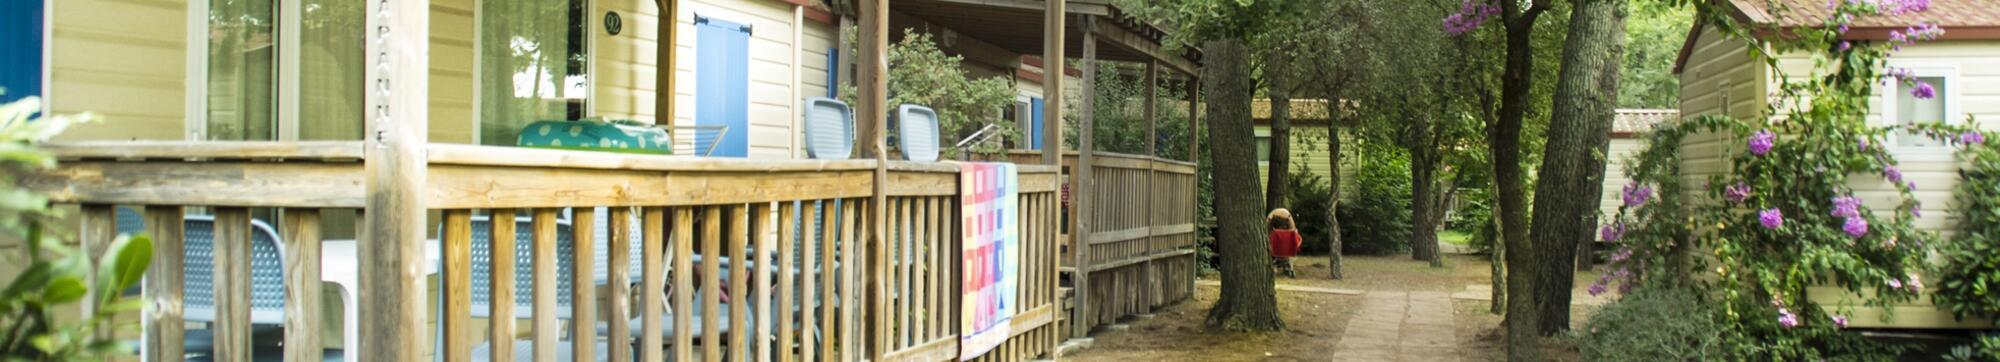 Offerta Settembre in camping village in Toscana: un'oasi per famiglie